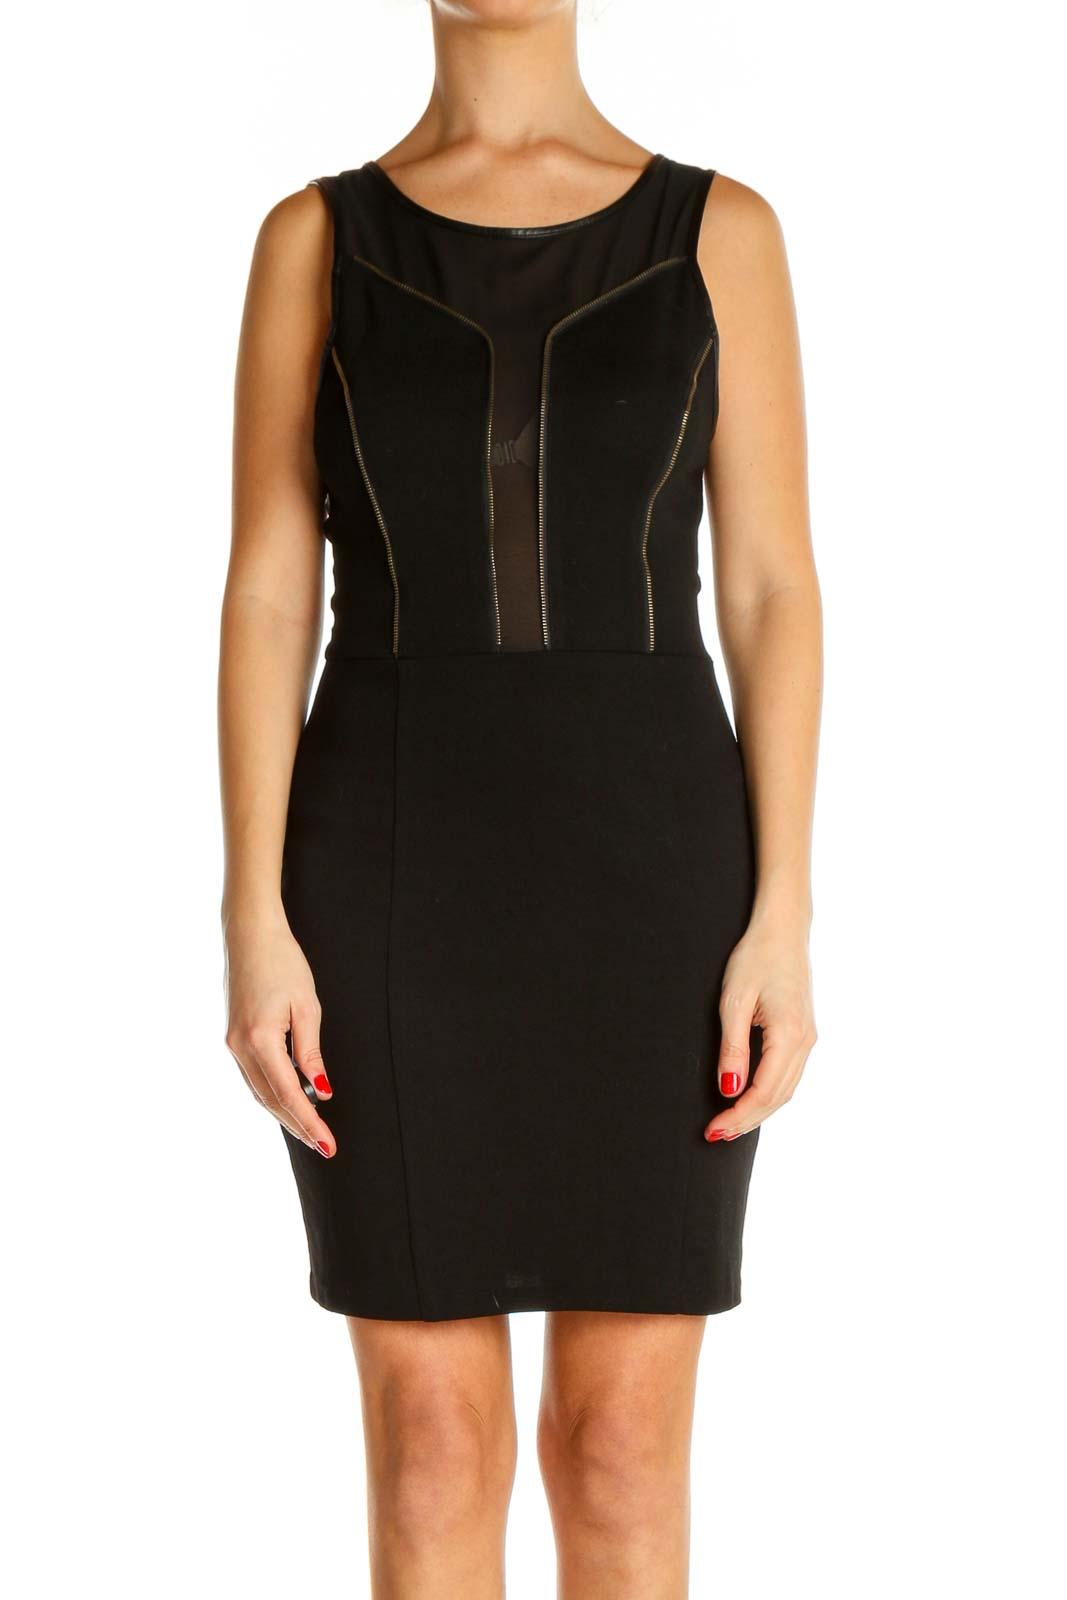 Black Textured Work Sheath Dress Front